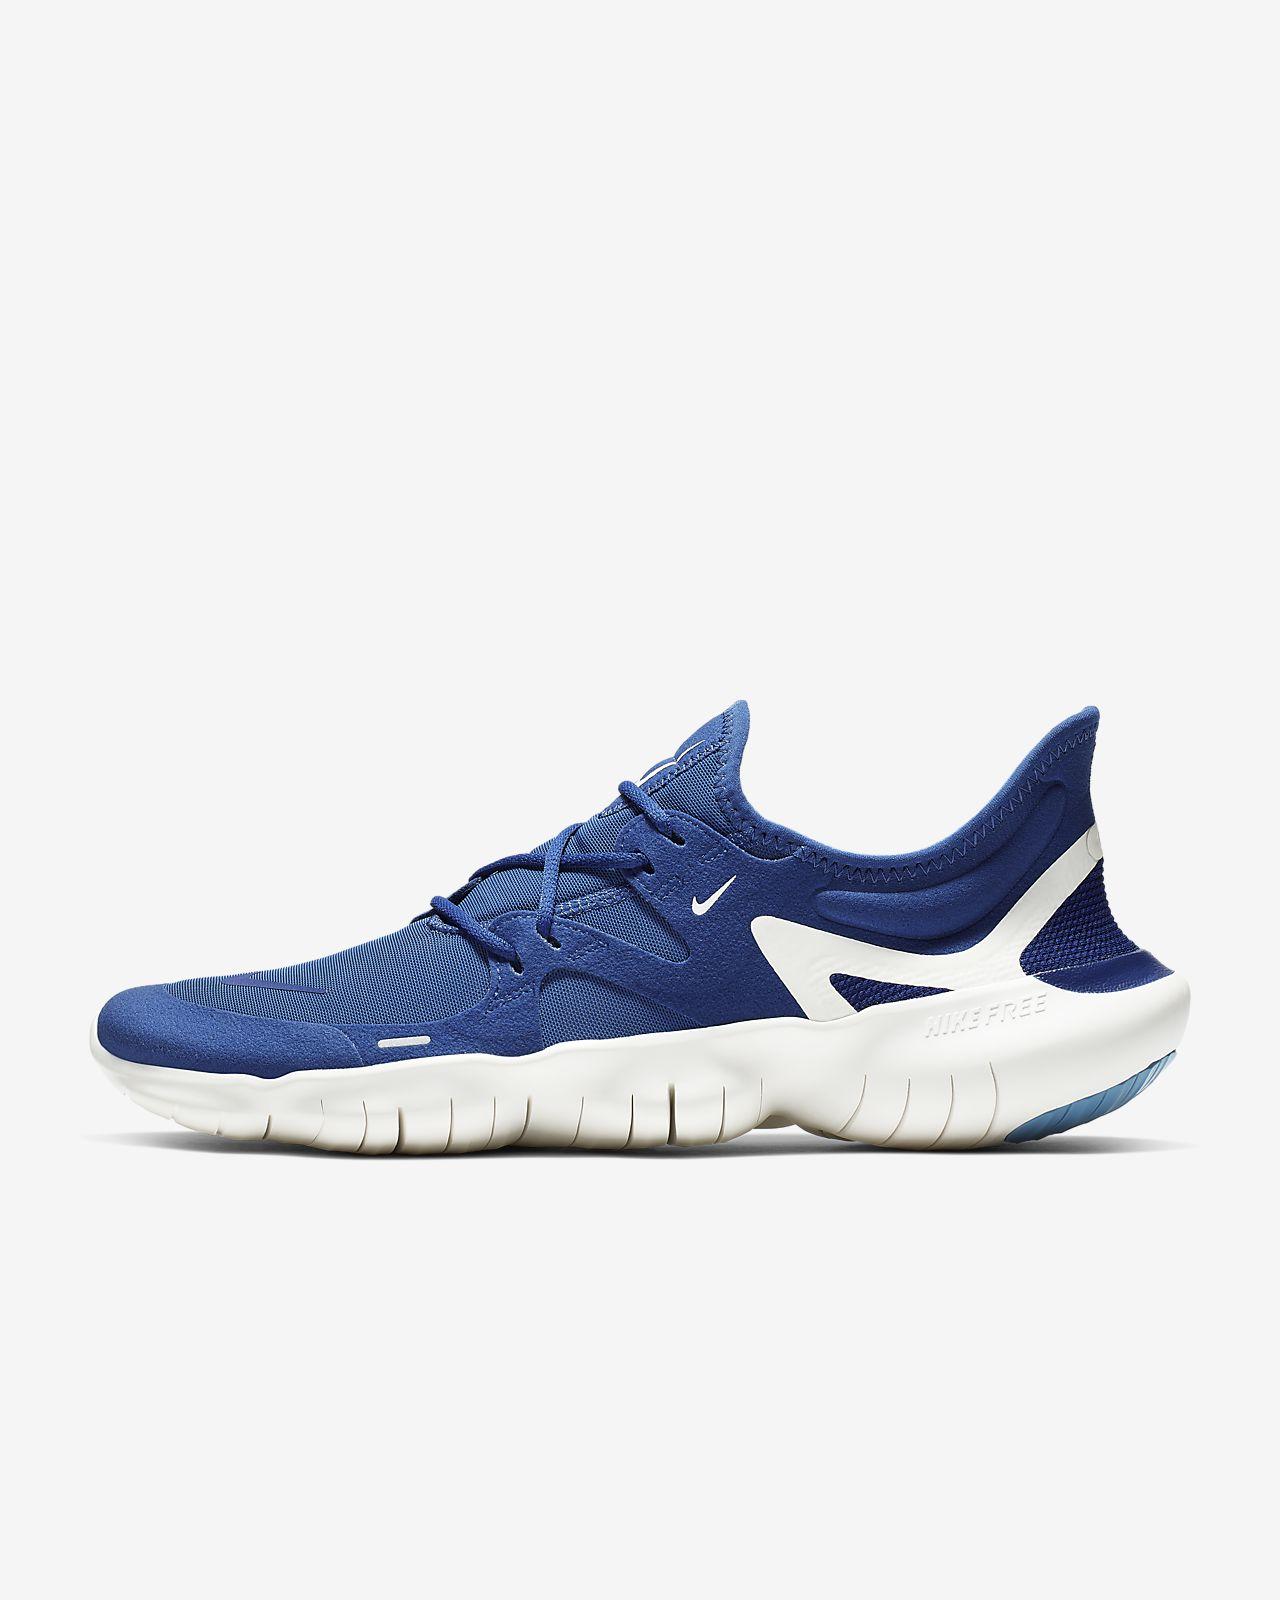 ab473bf03a7 Nike Free RN 5.0 Men s Running Shoe. Nike.com LU